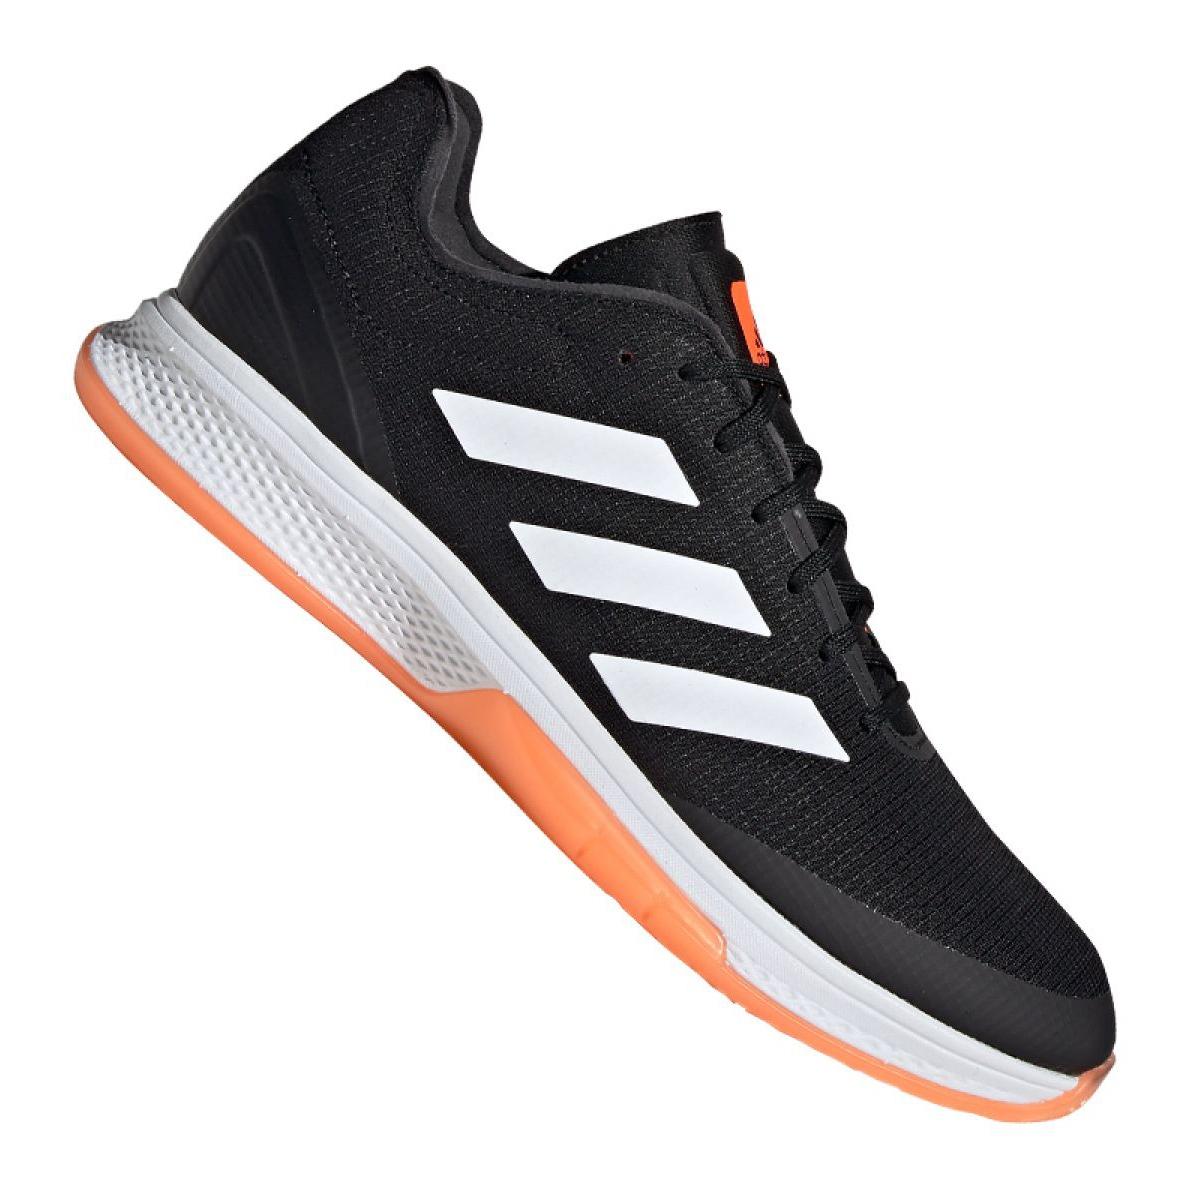 Adidas Counterblast Bounce M G26423